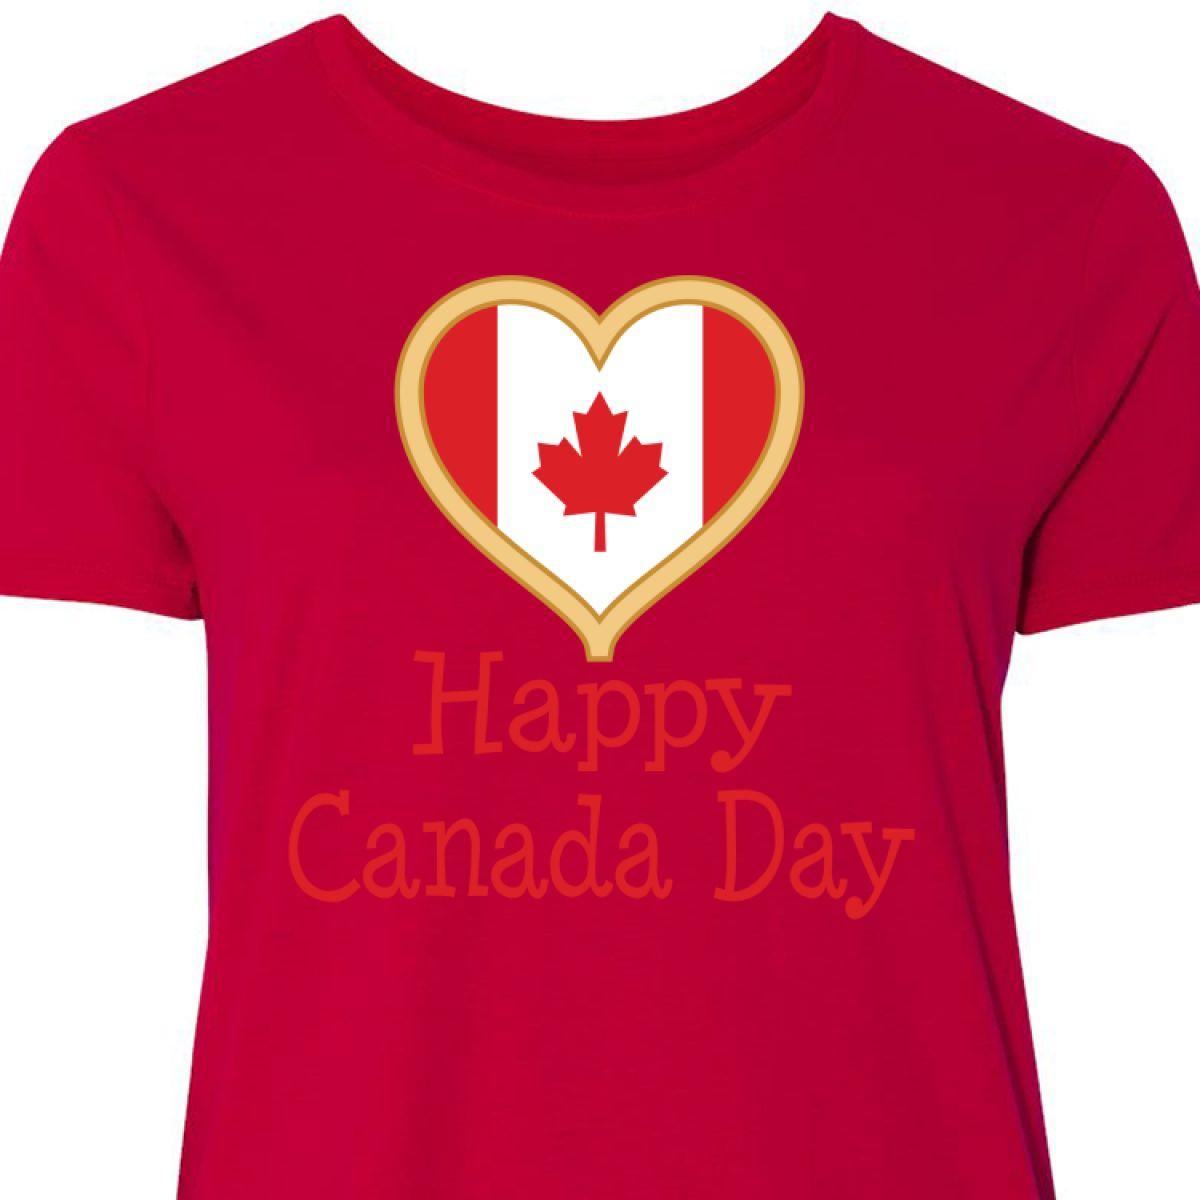 839bac814 Inktastic Happy Canada Day Women's Plus Size T-Shirt Maple Leaf ...